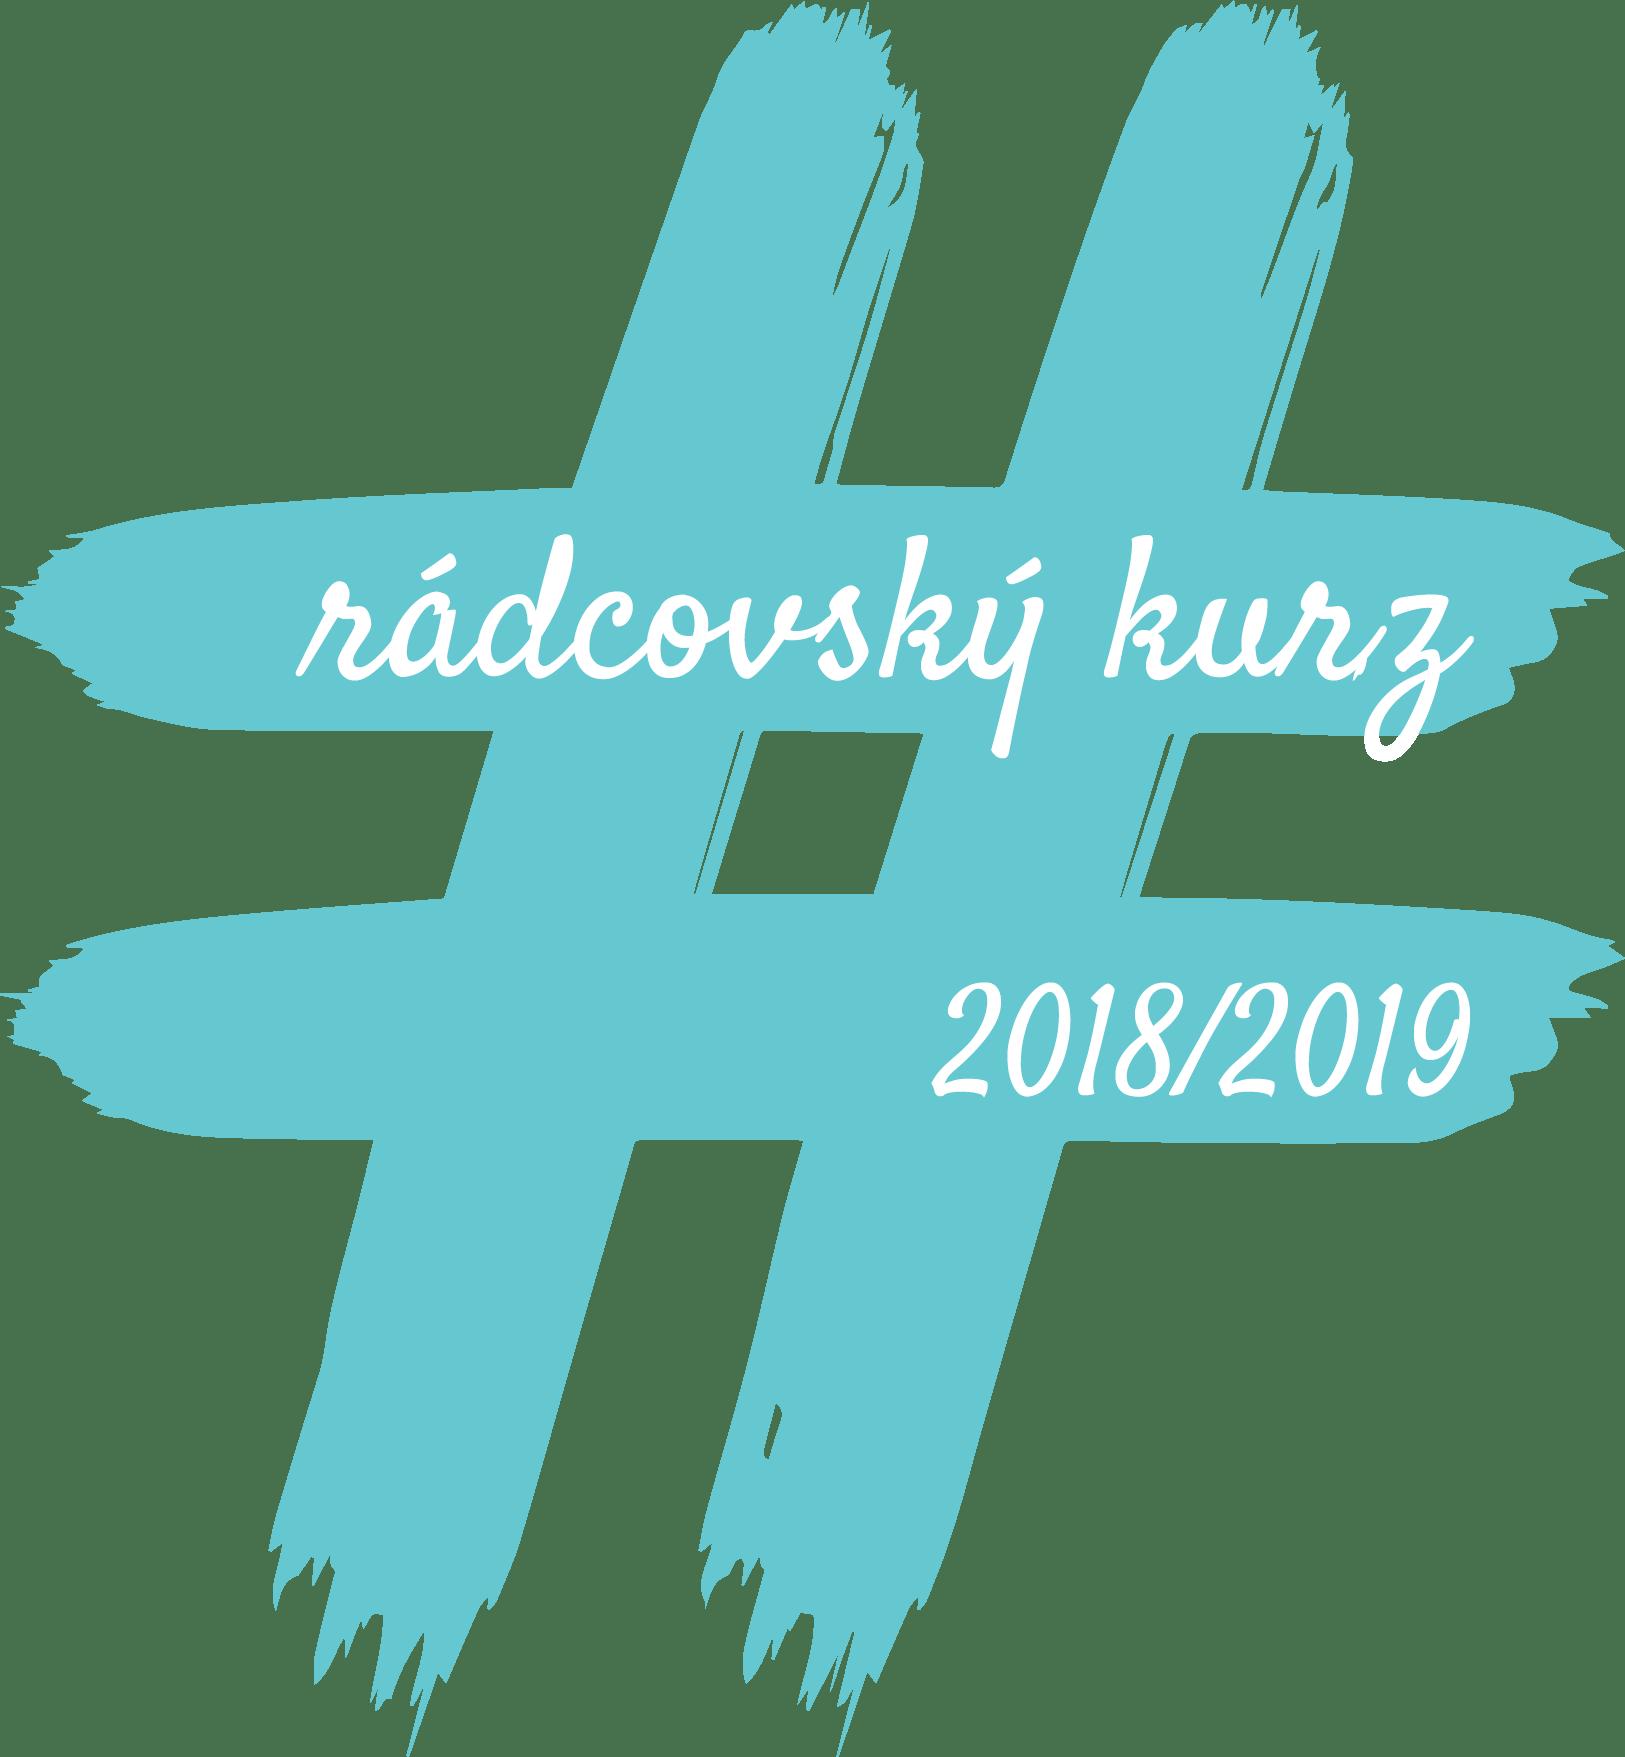 hestek.skauting.cz